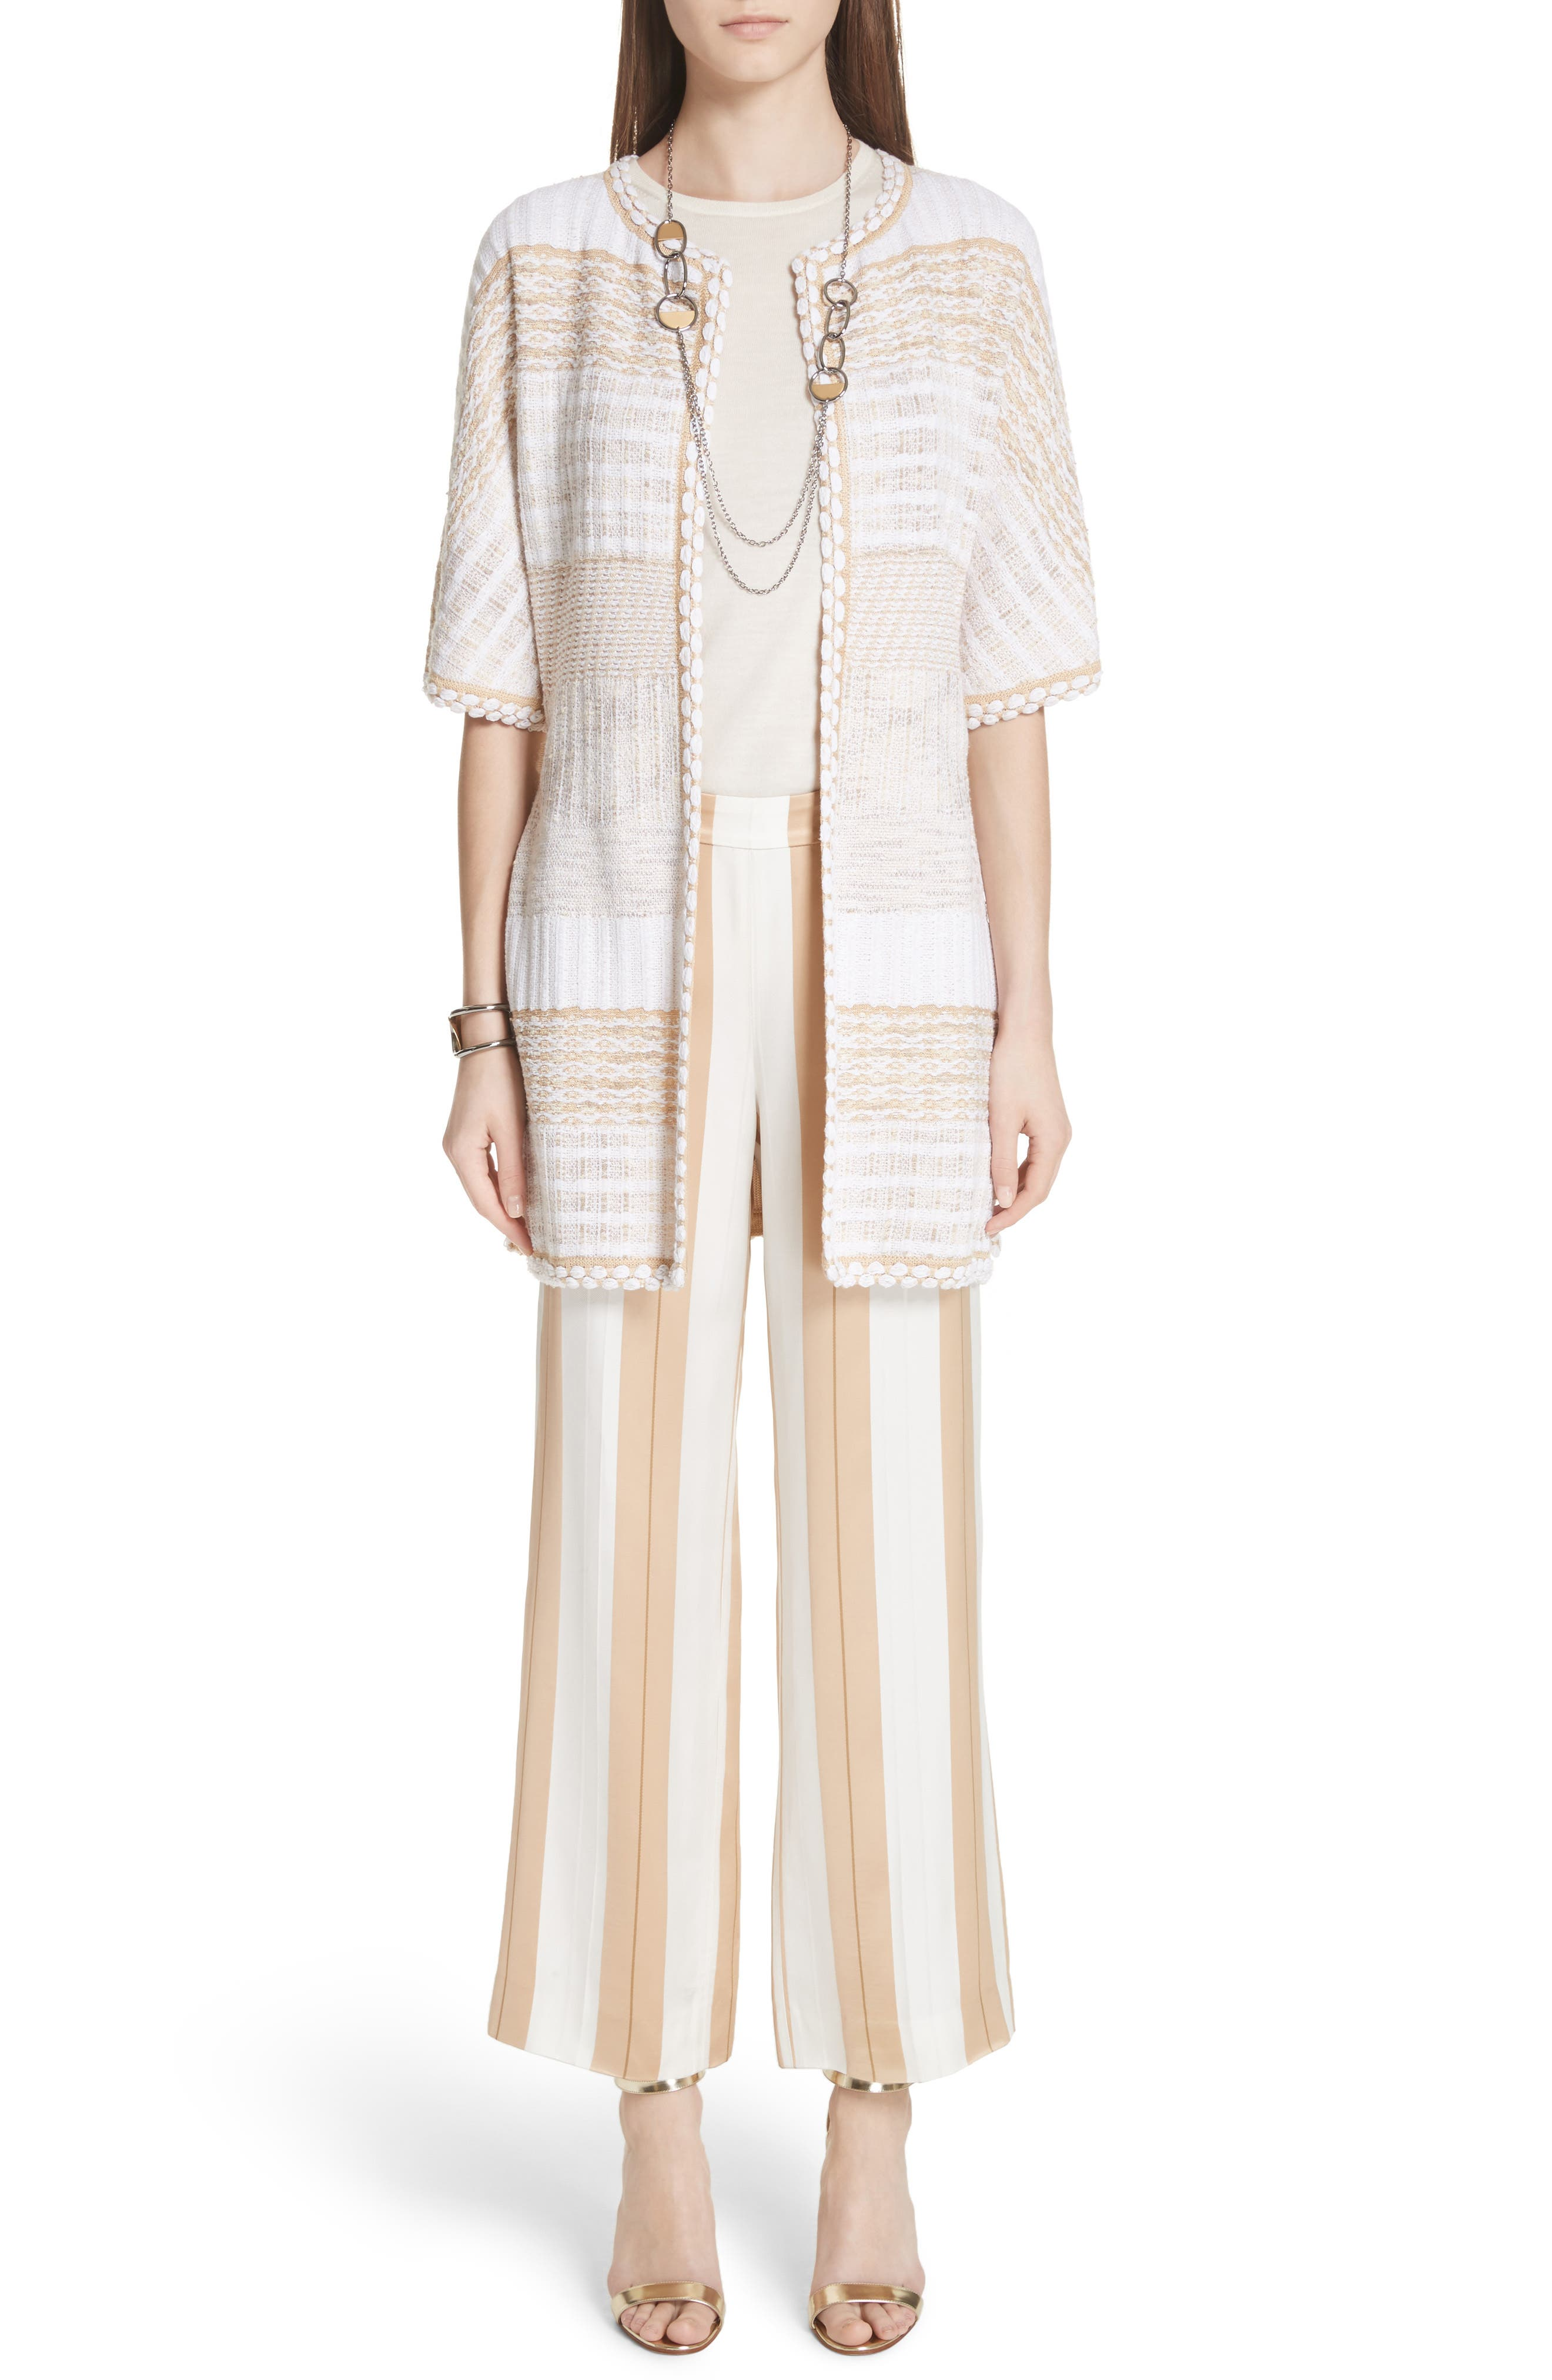 ST. JOHN COLLECTION,                             Mixed Floats Stripe Knit Jacket,                             Alternate thumbnail 7, color,                             700